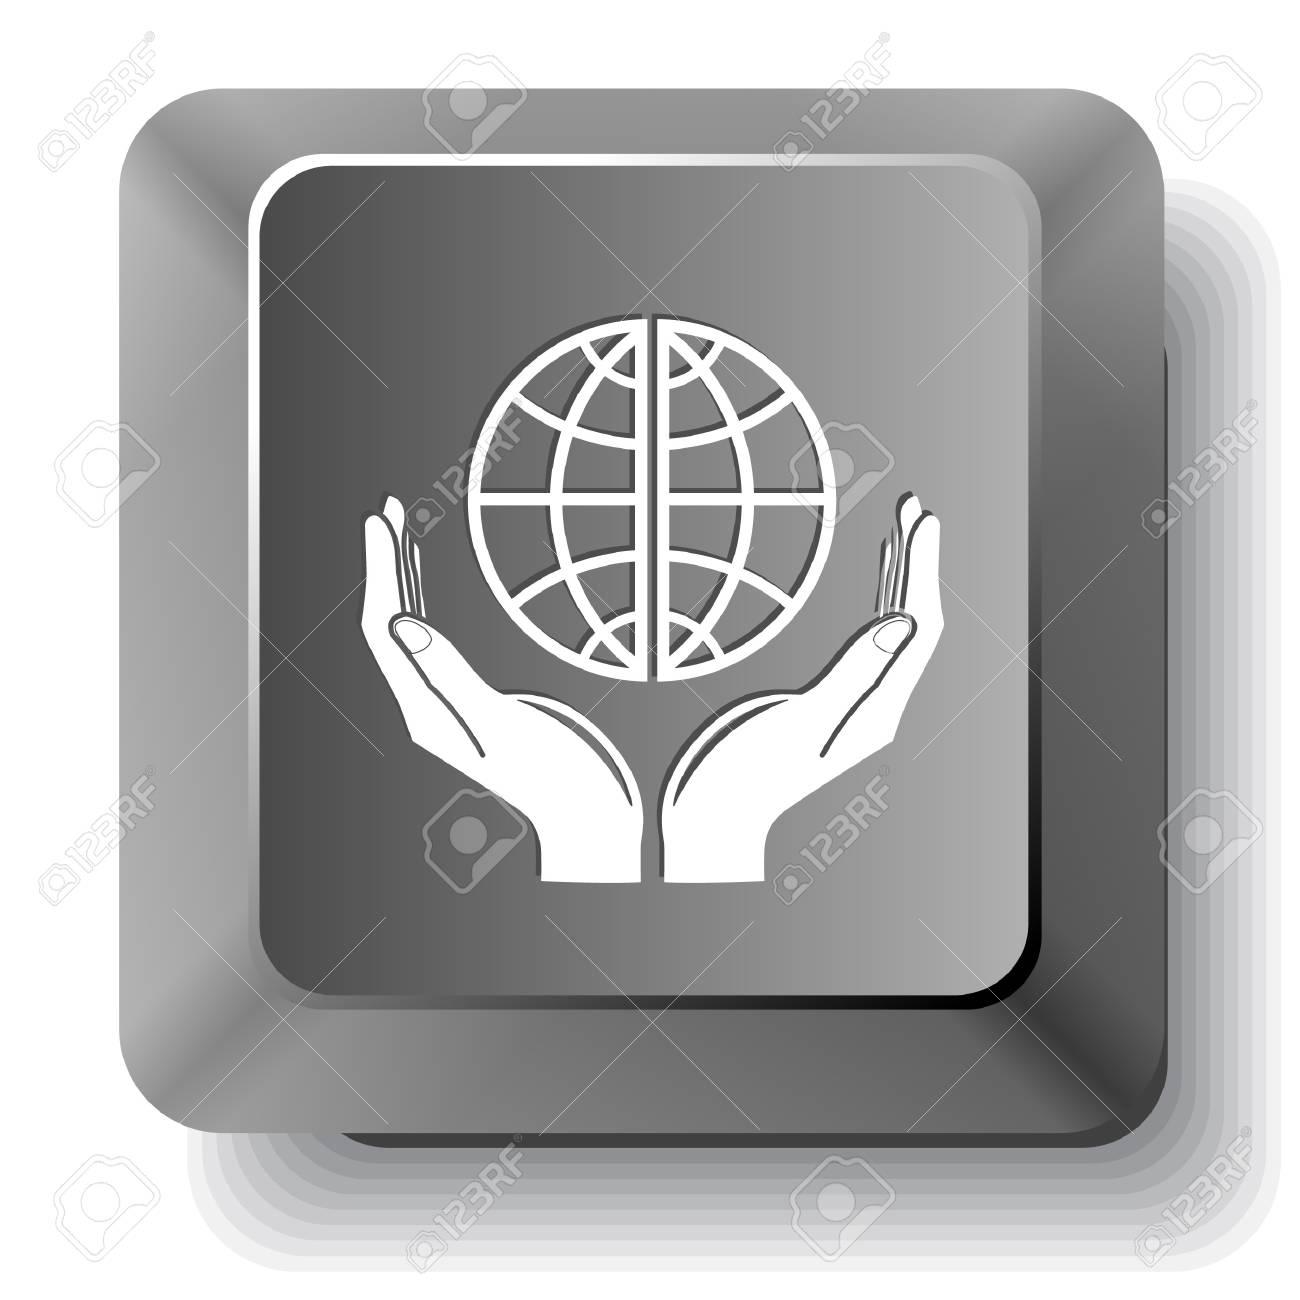 Protection world. Vector computer key. Stock Photo - 18278158